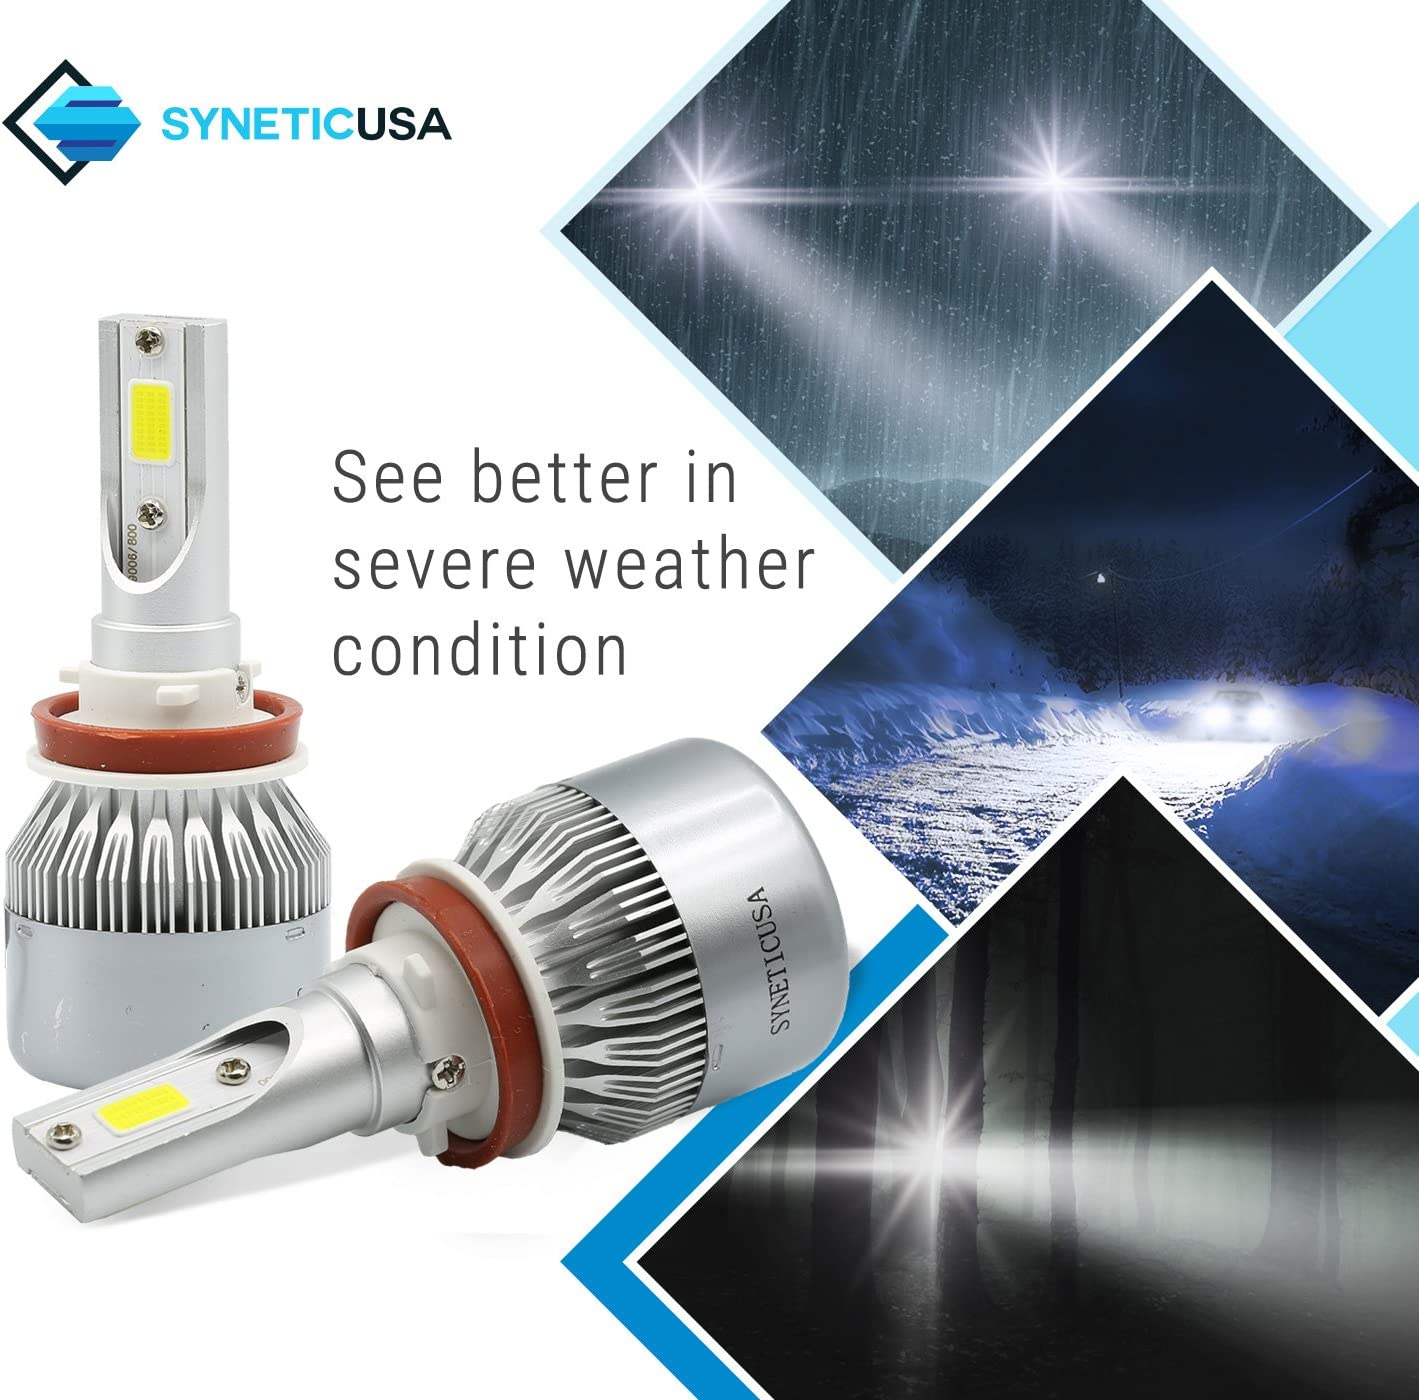 H11 Syneticusa LED High//Low Beam Headlight Conversion Kit Light Bulbs 100W 10000LM 6000K White